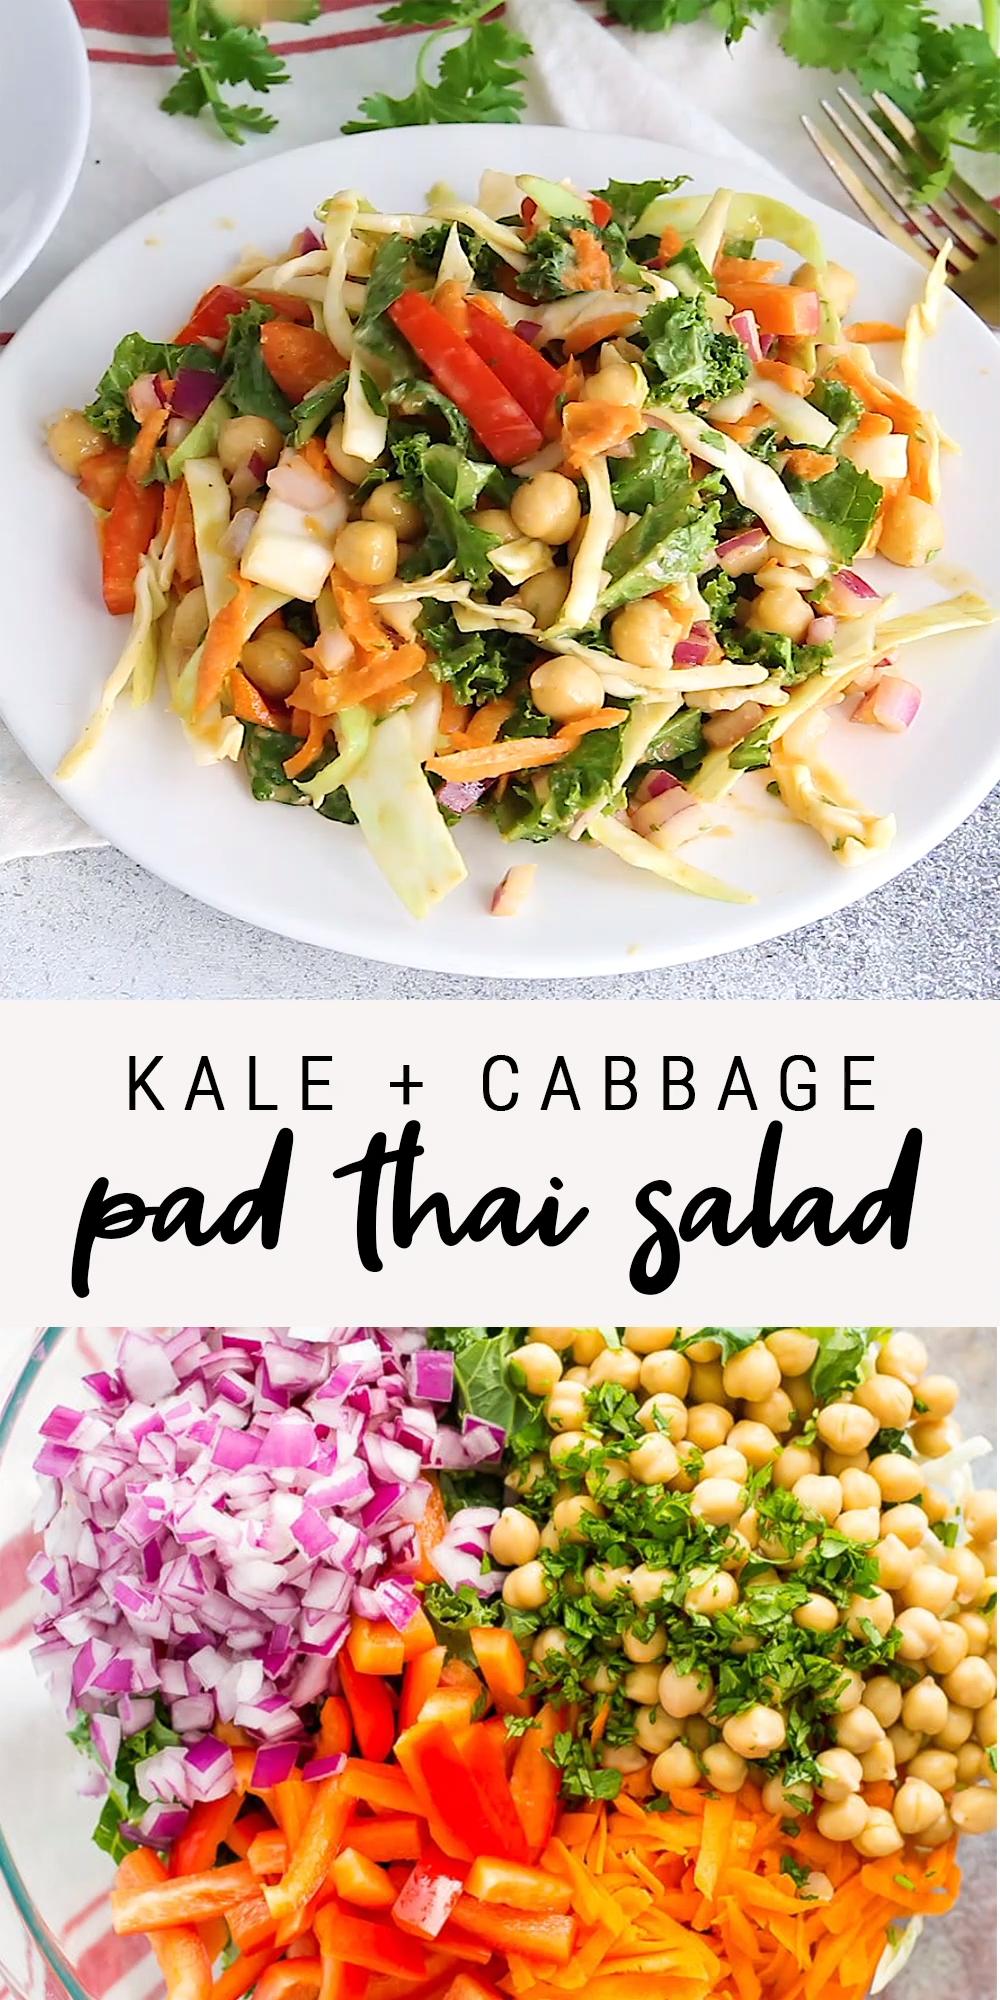 Kale + Cabbage Pad Thai Salad